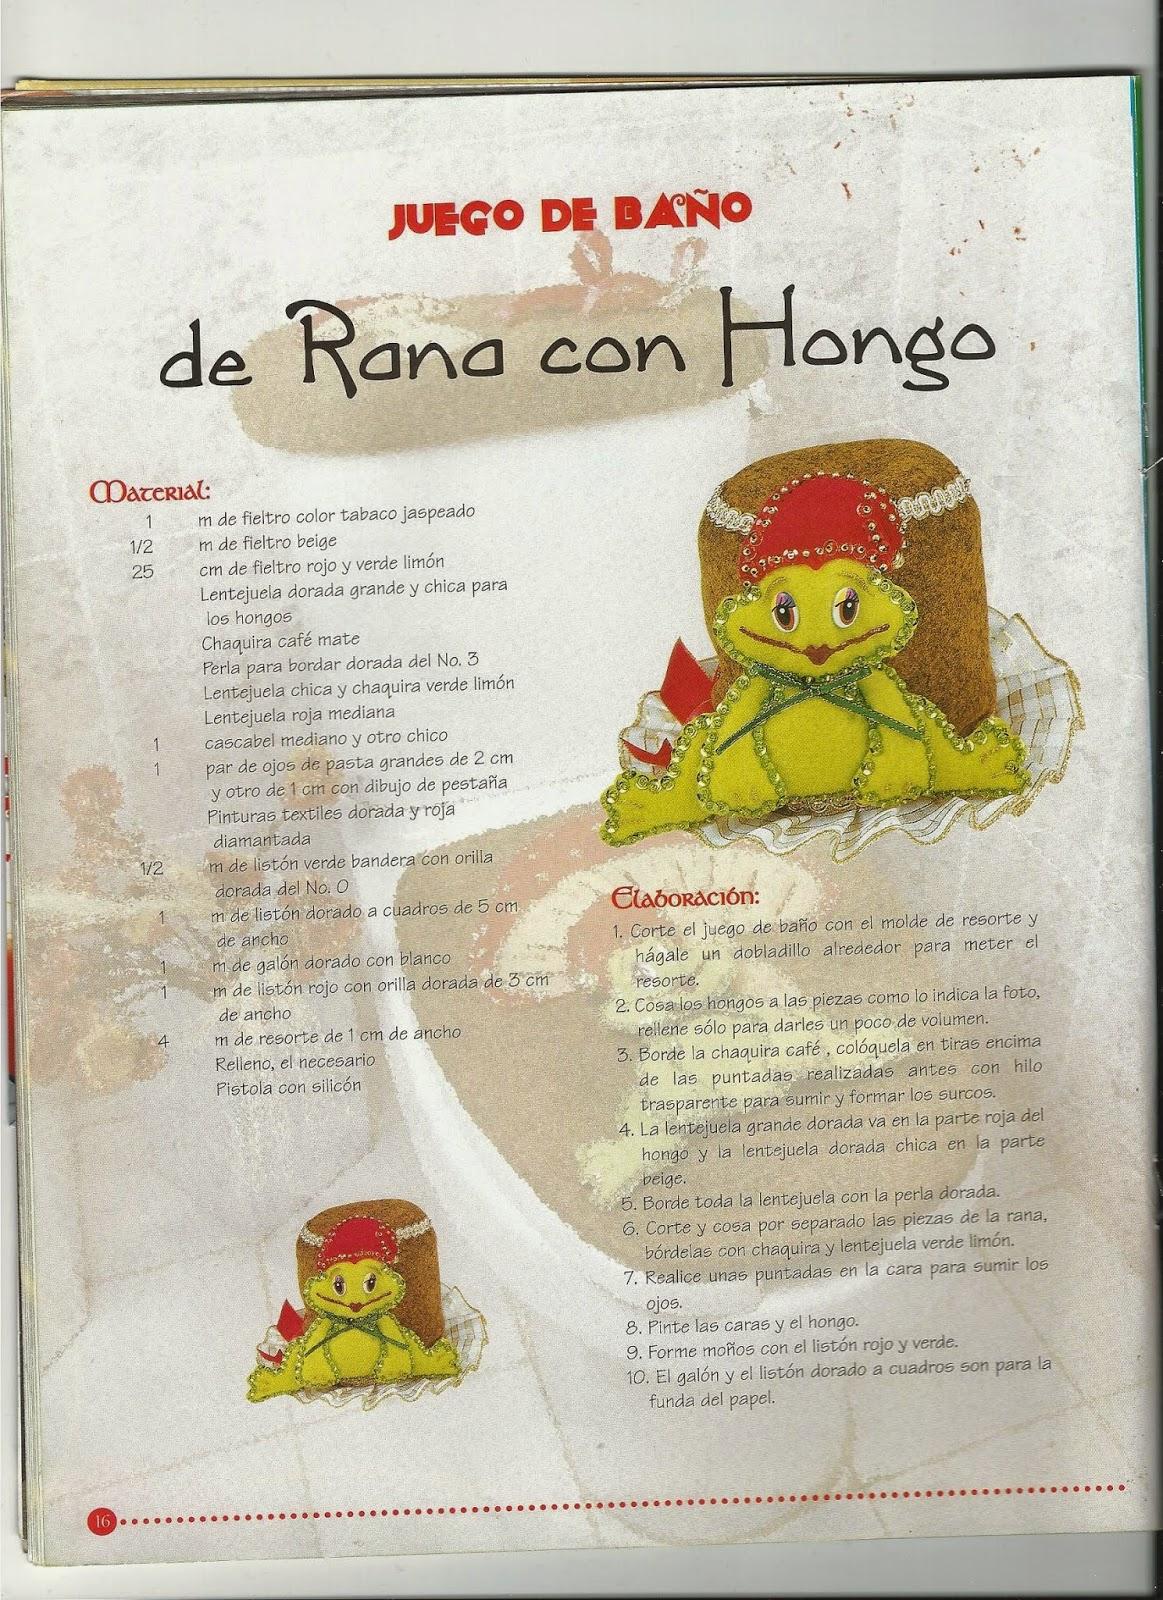 Juegos De Gatos Baño:UN GATO DE TRAPO: ♥ JUEGO DE BAÑO RANITA CON HONGO ♥